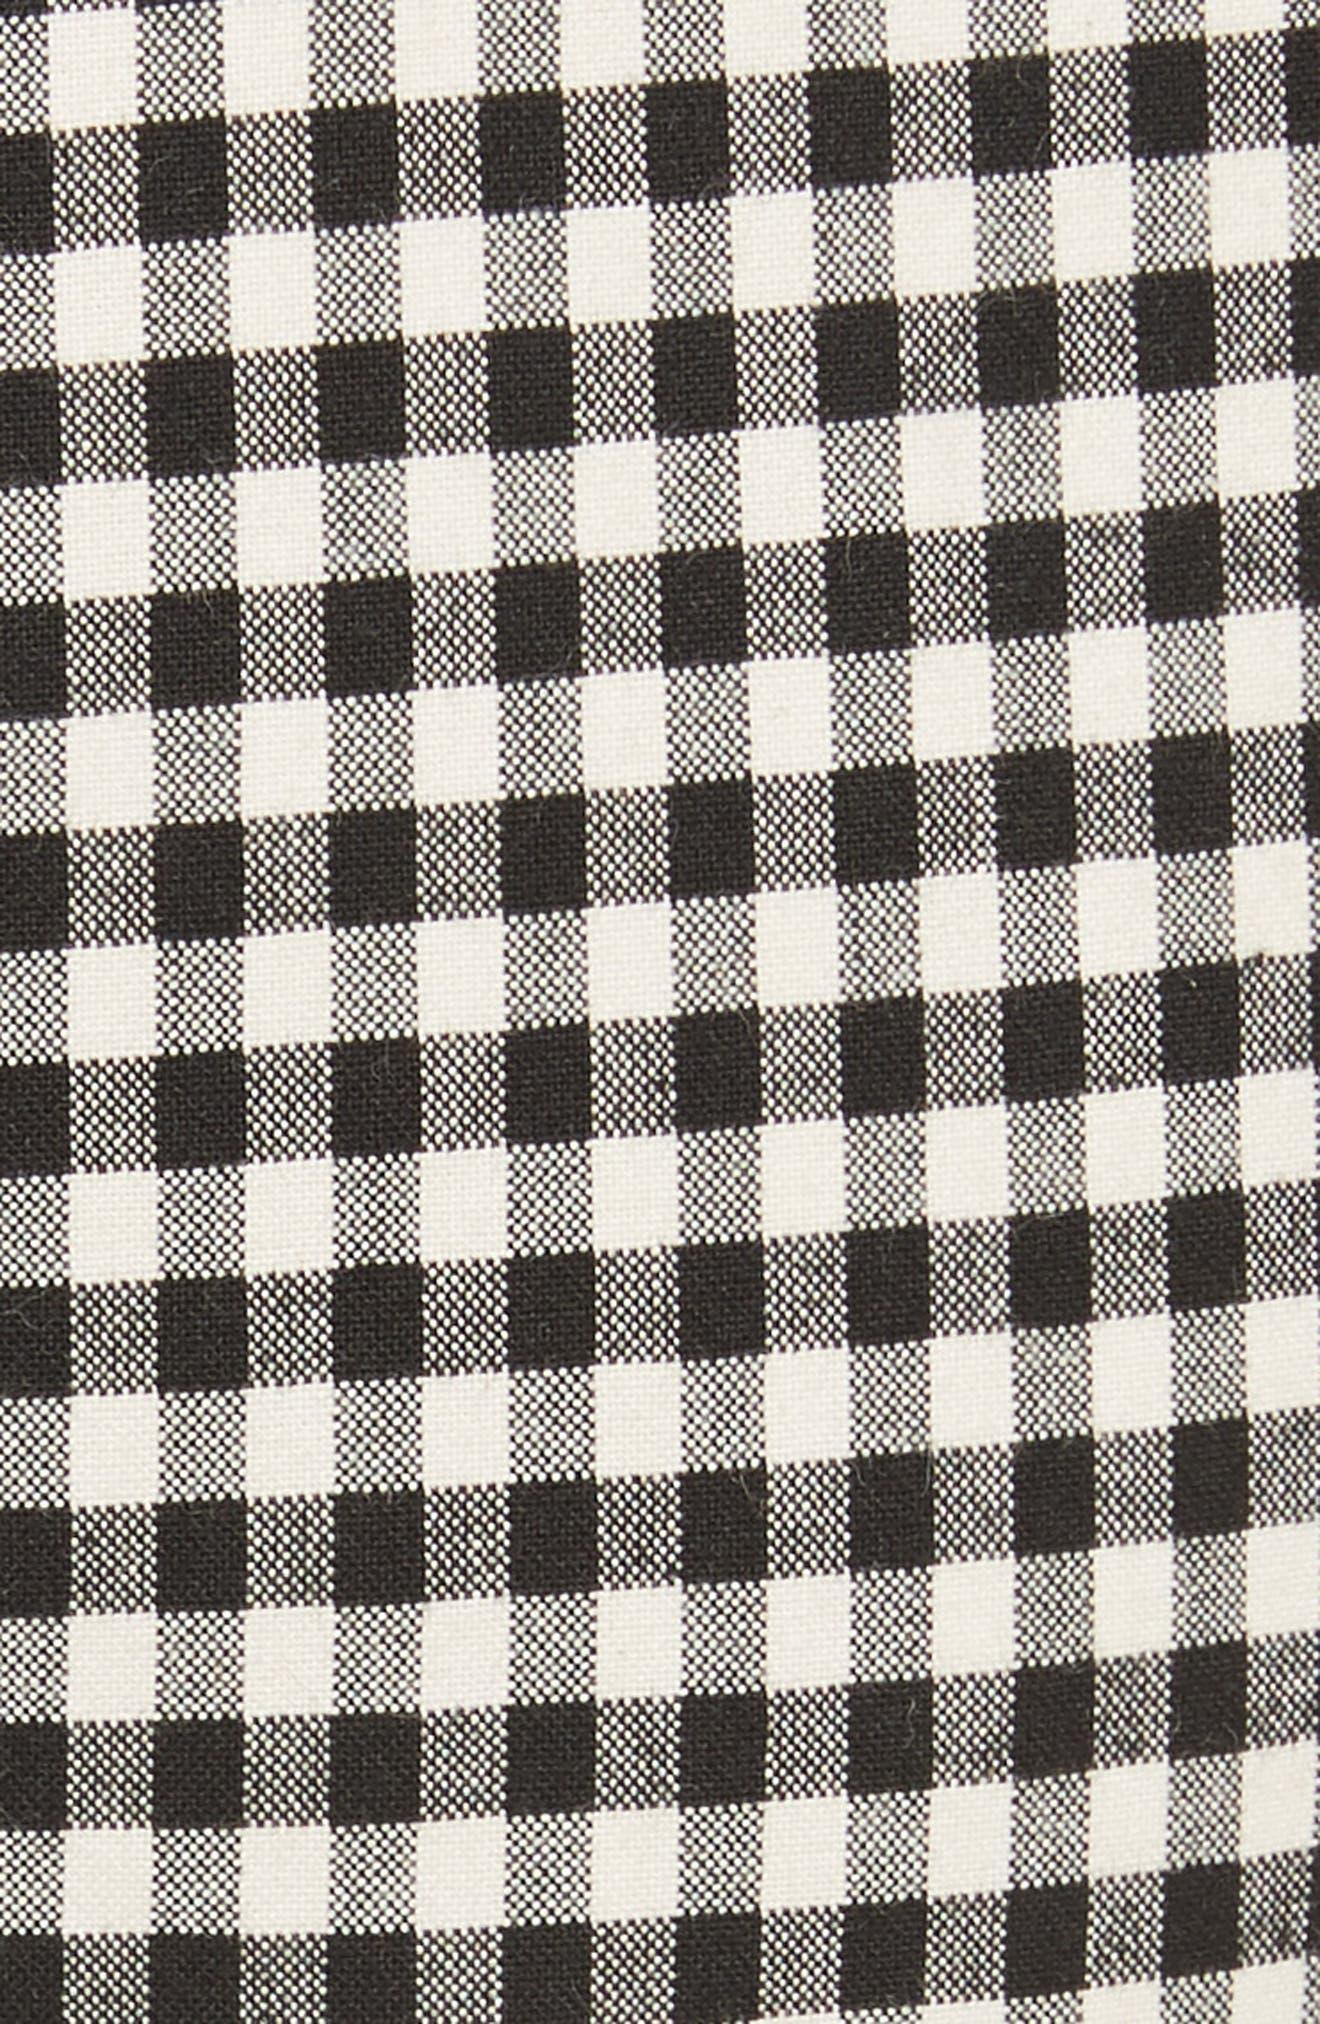 Alternate Image 5  - Veronica Beard Tee High Waisted Seam Trousers